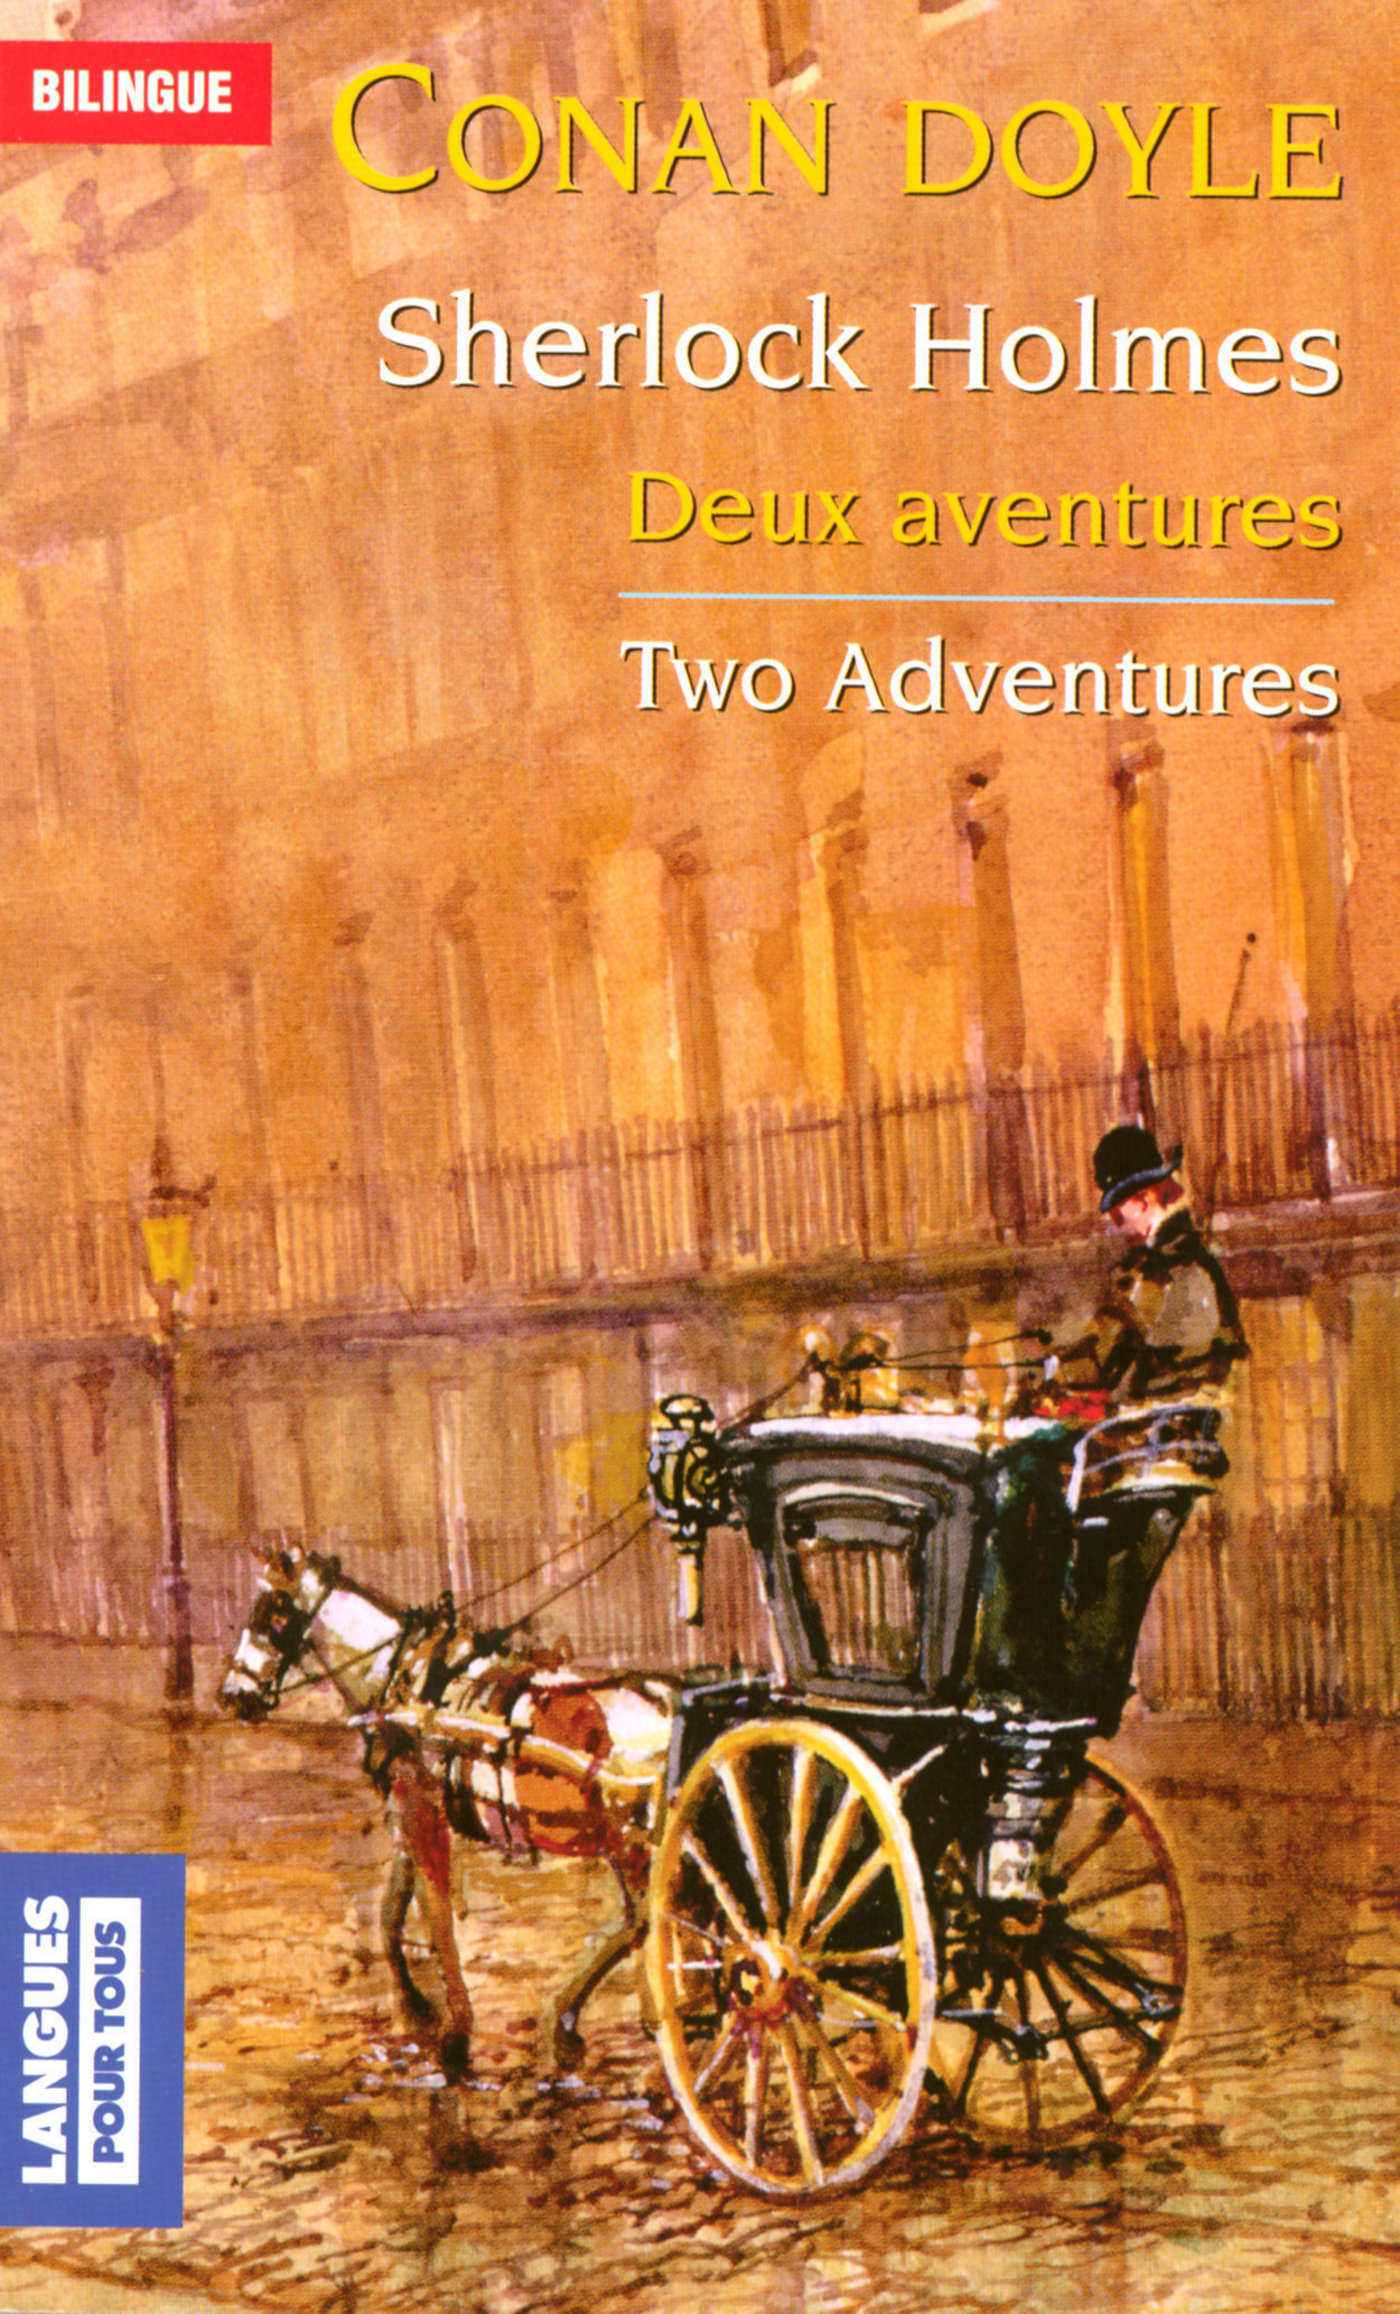 Sherlock Holmes - Deux aventures / Two Adventures, TWO ADVENTURES OF SHERLOCK HOLMES